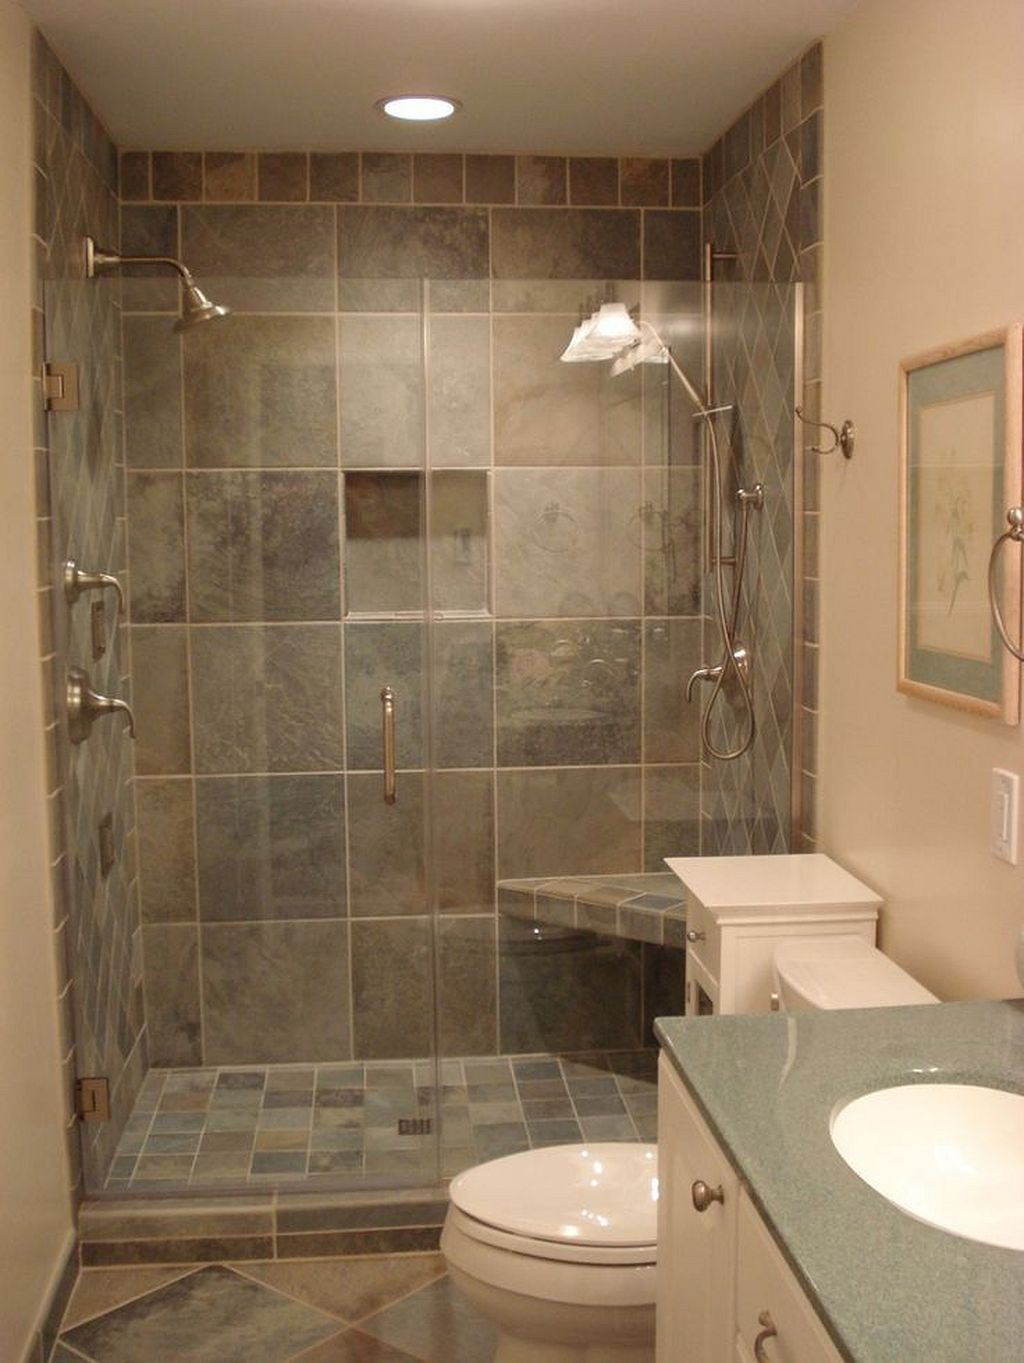 Small Bathroom Remodel Gallery Cheap Bathroom Remodel Small Shower Remodel Bathroom Remodel Shower